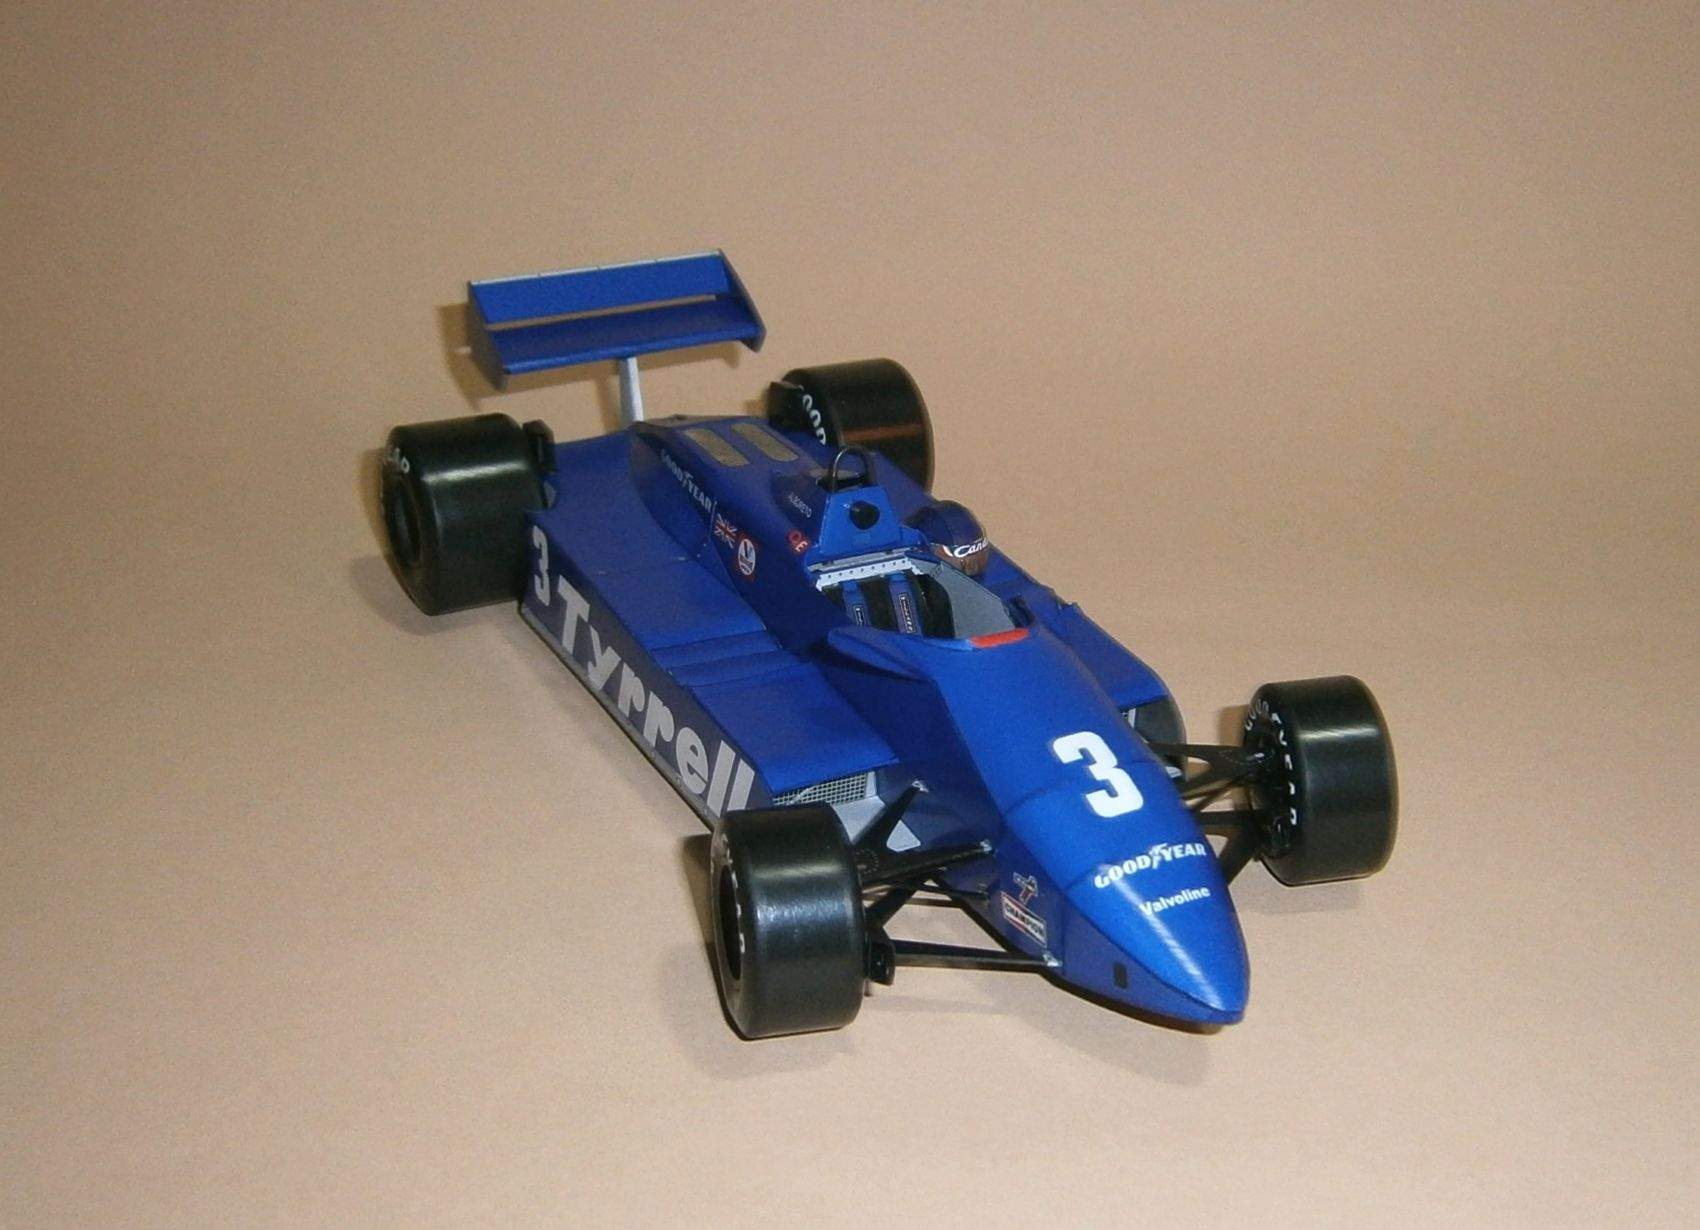 Tyrrell 011 - M.Alboreto, GP Jacarepagua 1982